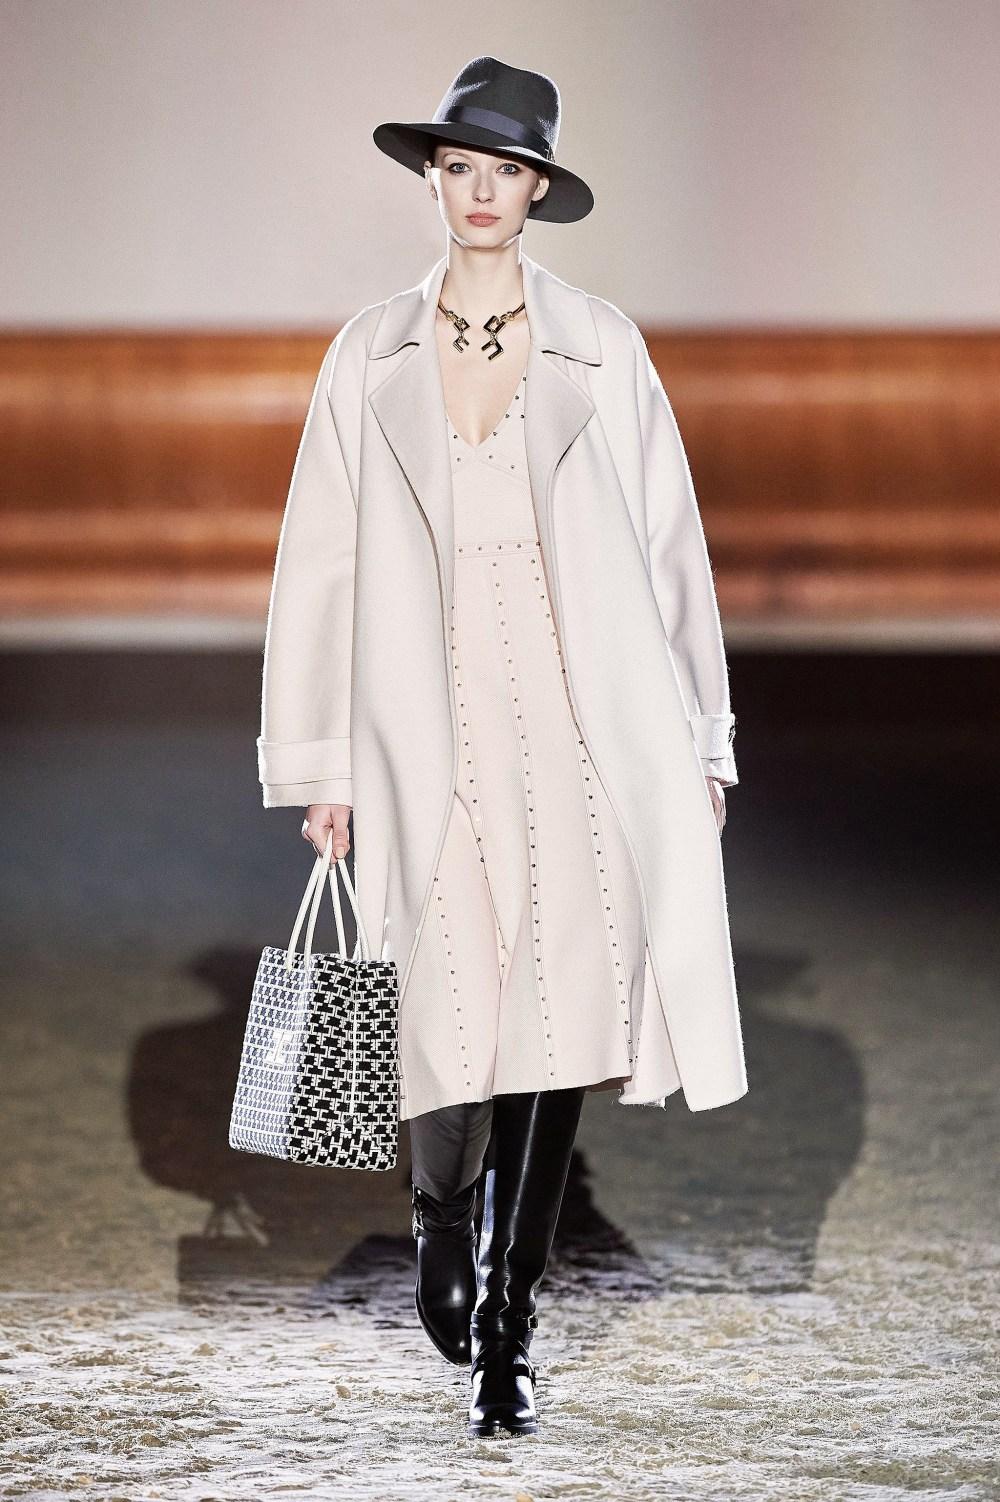 Elisabetta Franchi: Elisabetta Franchi Fall Winter 2021-22 Fashion Show Photo #33